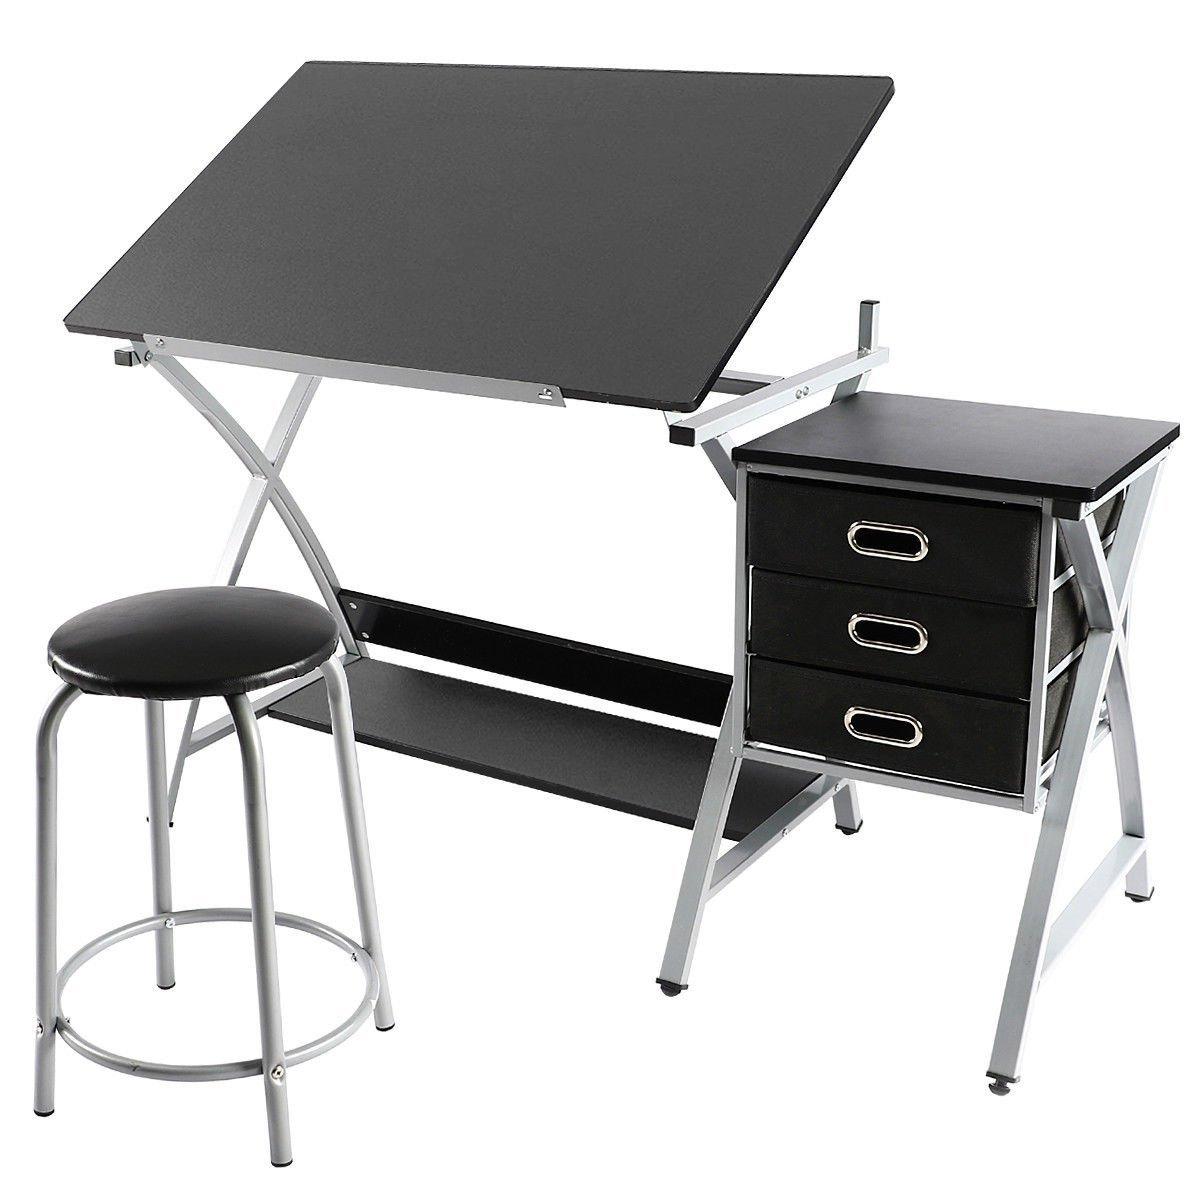 Super Cheap Drawing Board Stool Find Drawing Board Stool Deals On Creativecarmelina Interior Chair Design Creativecarmelinacom